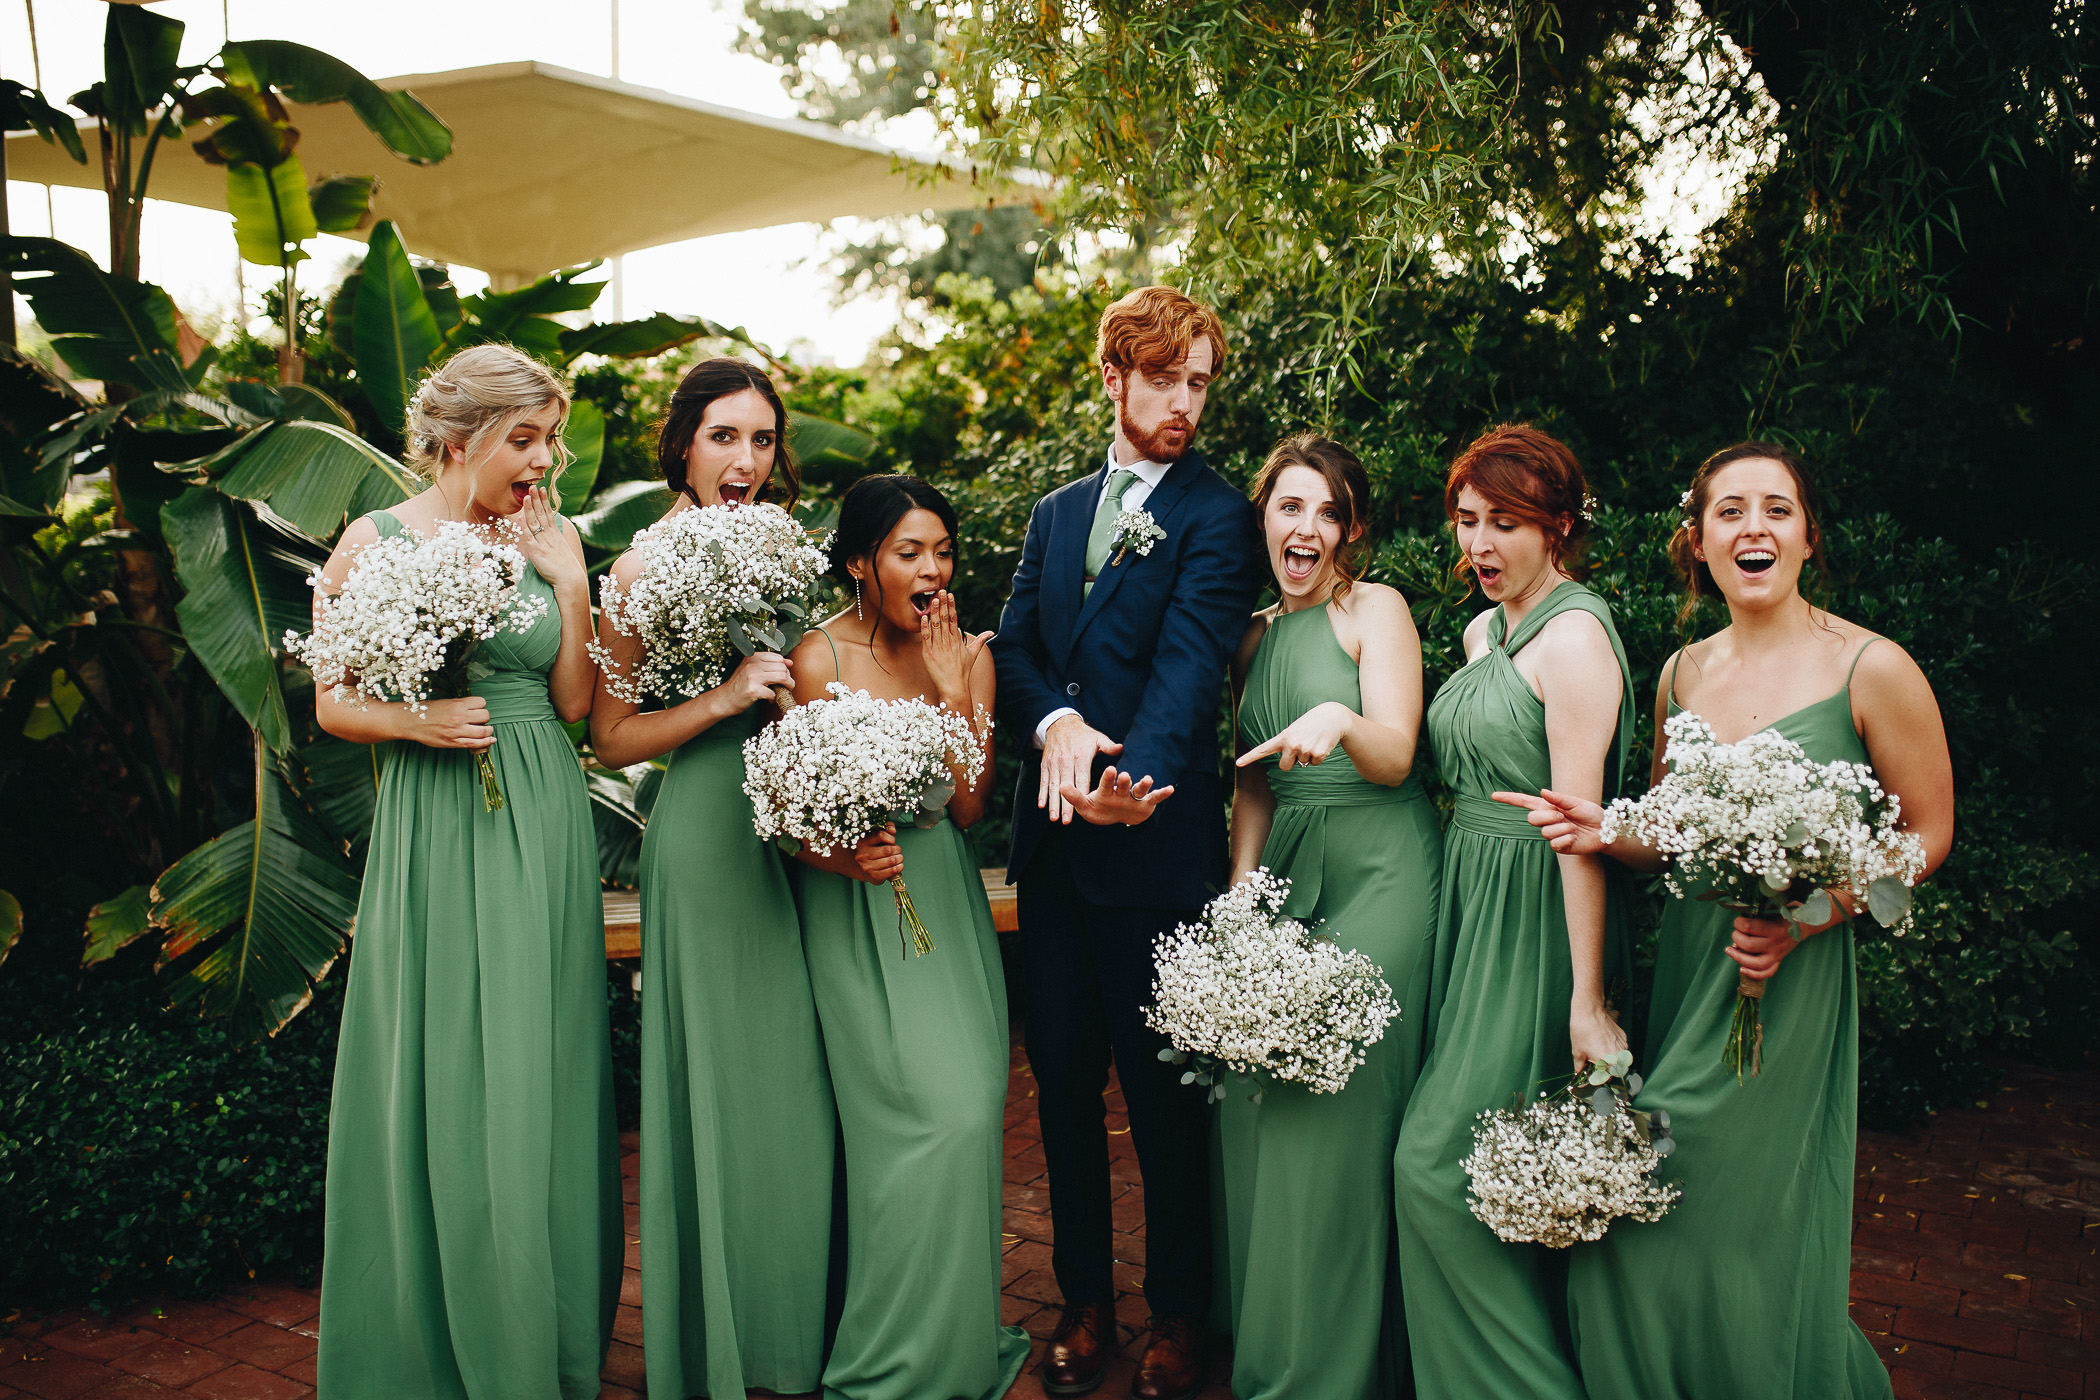 181104-Luxium-Weddings-Arizona-@matt__Le-Brandon-Kariana-Phoenix-Valley-Garden-Center-1090.jpg